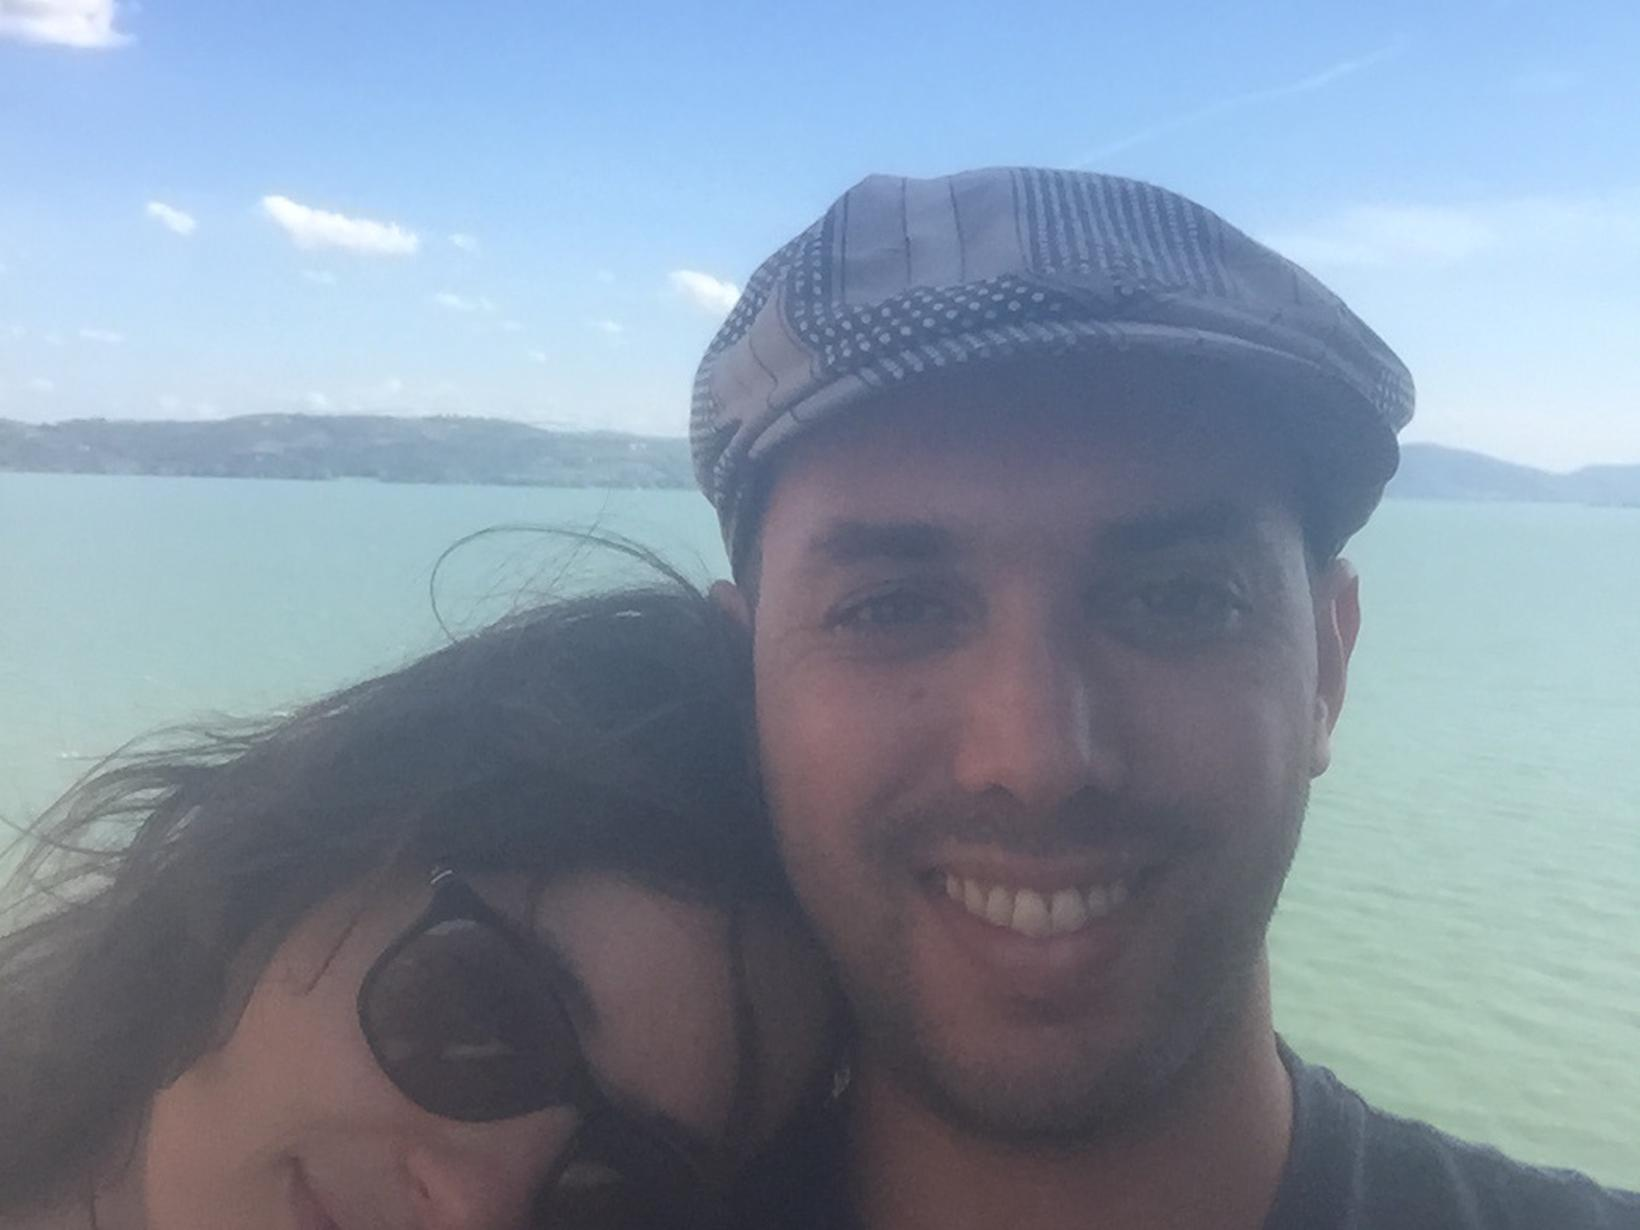 Moriya & Ophir from Tel Aviv, Israel